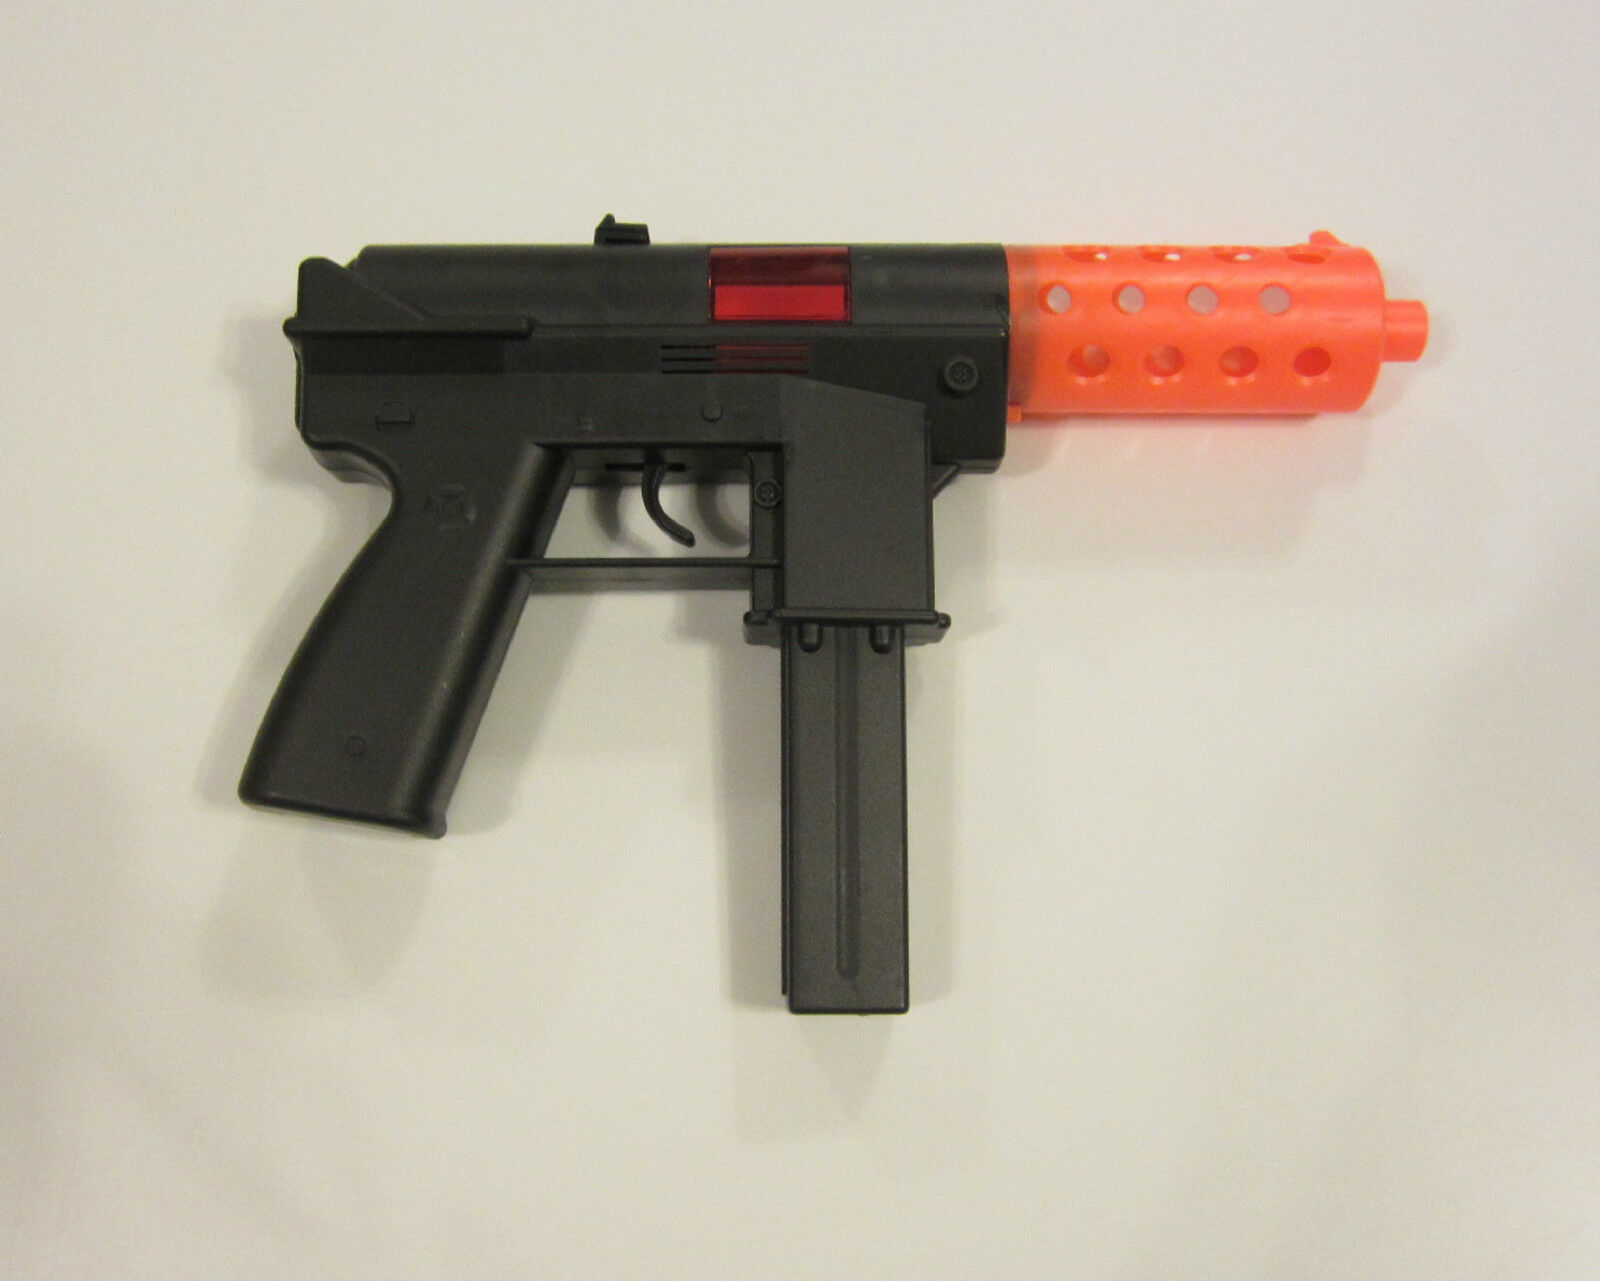 1 NEW KG9 HANDGUN TOY TOY TOY CAP GUN 9  POLICE PISTOL DETECTIVE  FIRES 8 RING CAPS c3c1e6